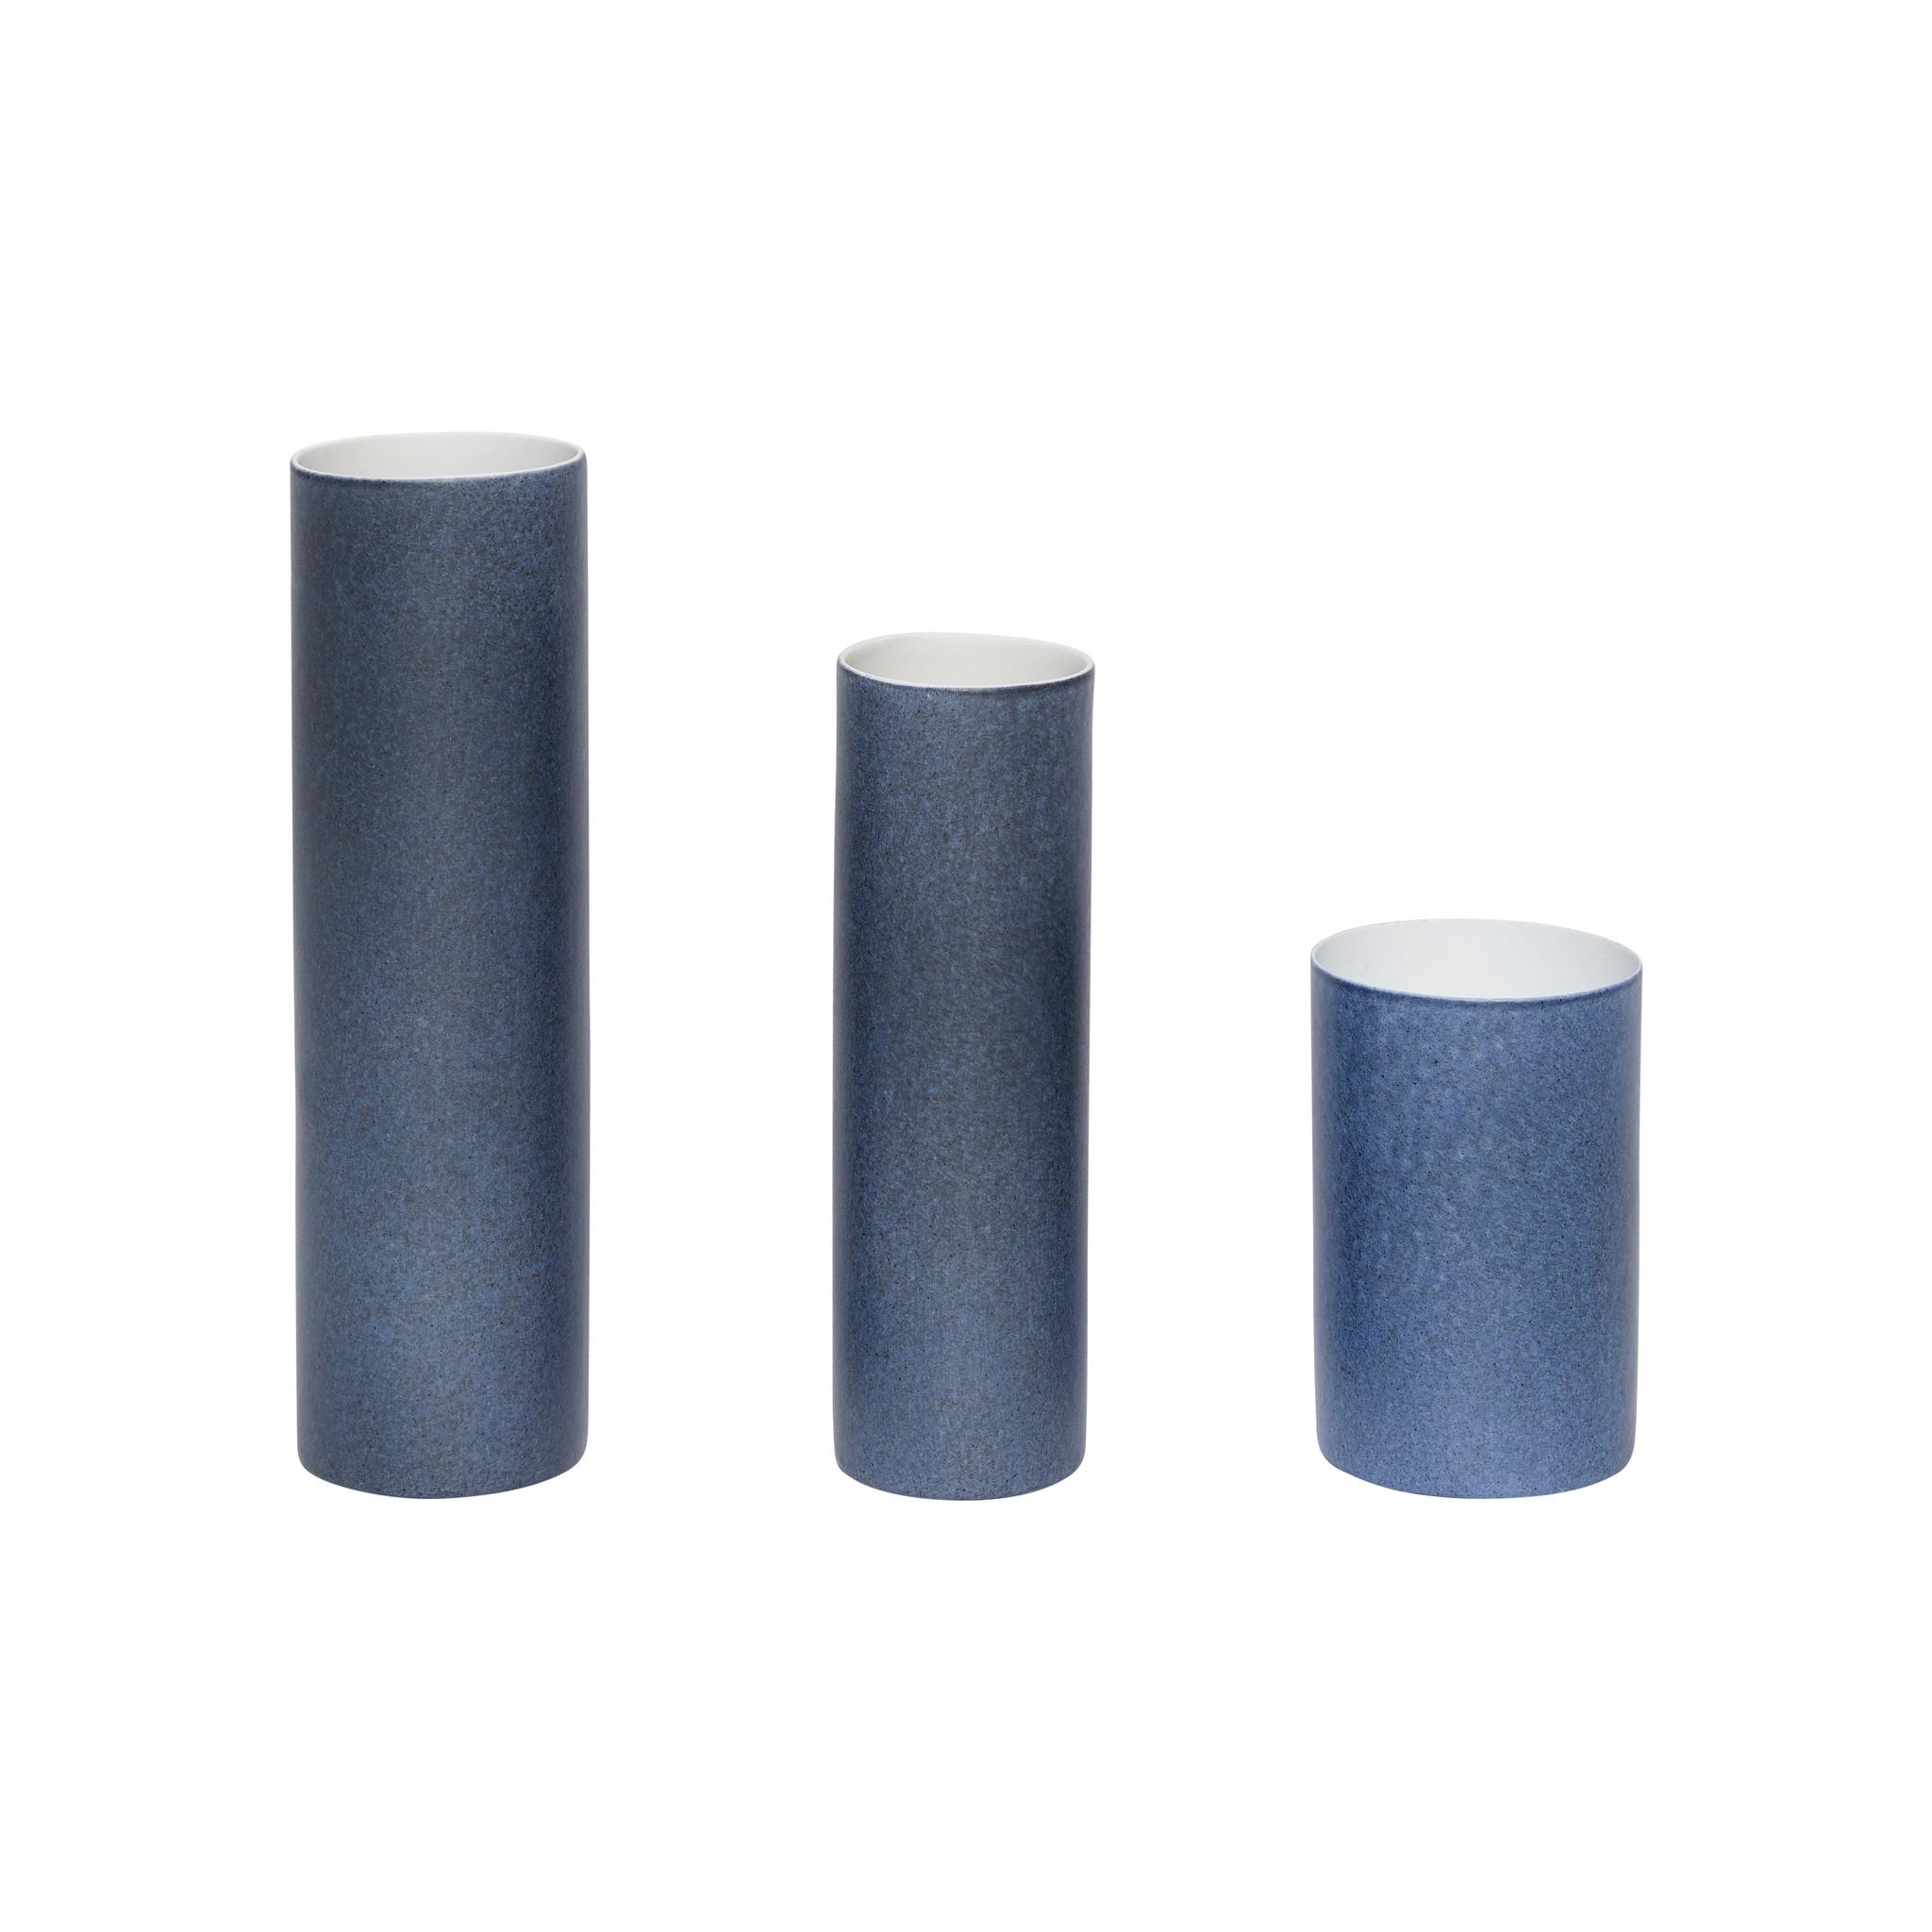 Hubsch Vaas, porselein, blauw, set van 3-420301-5712772054697